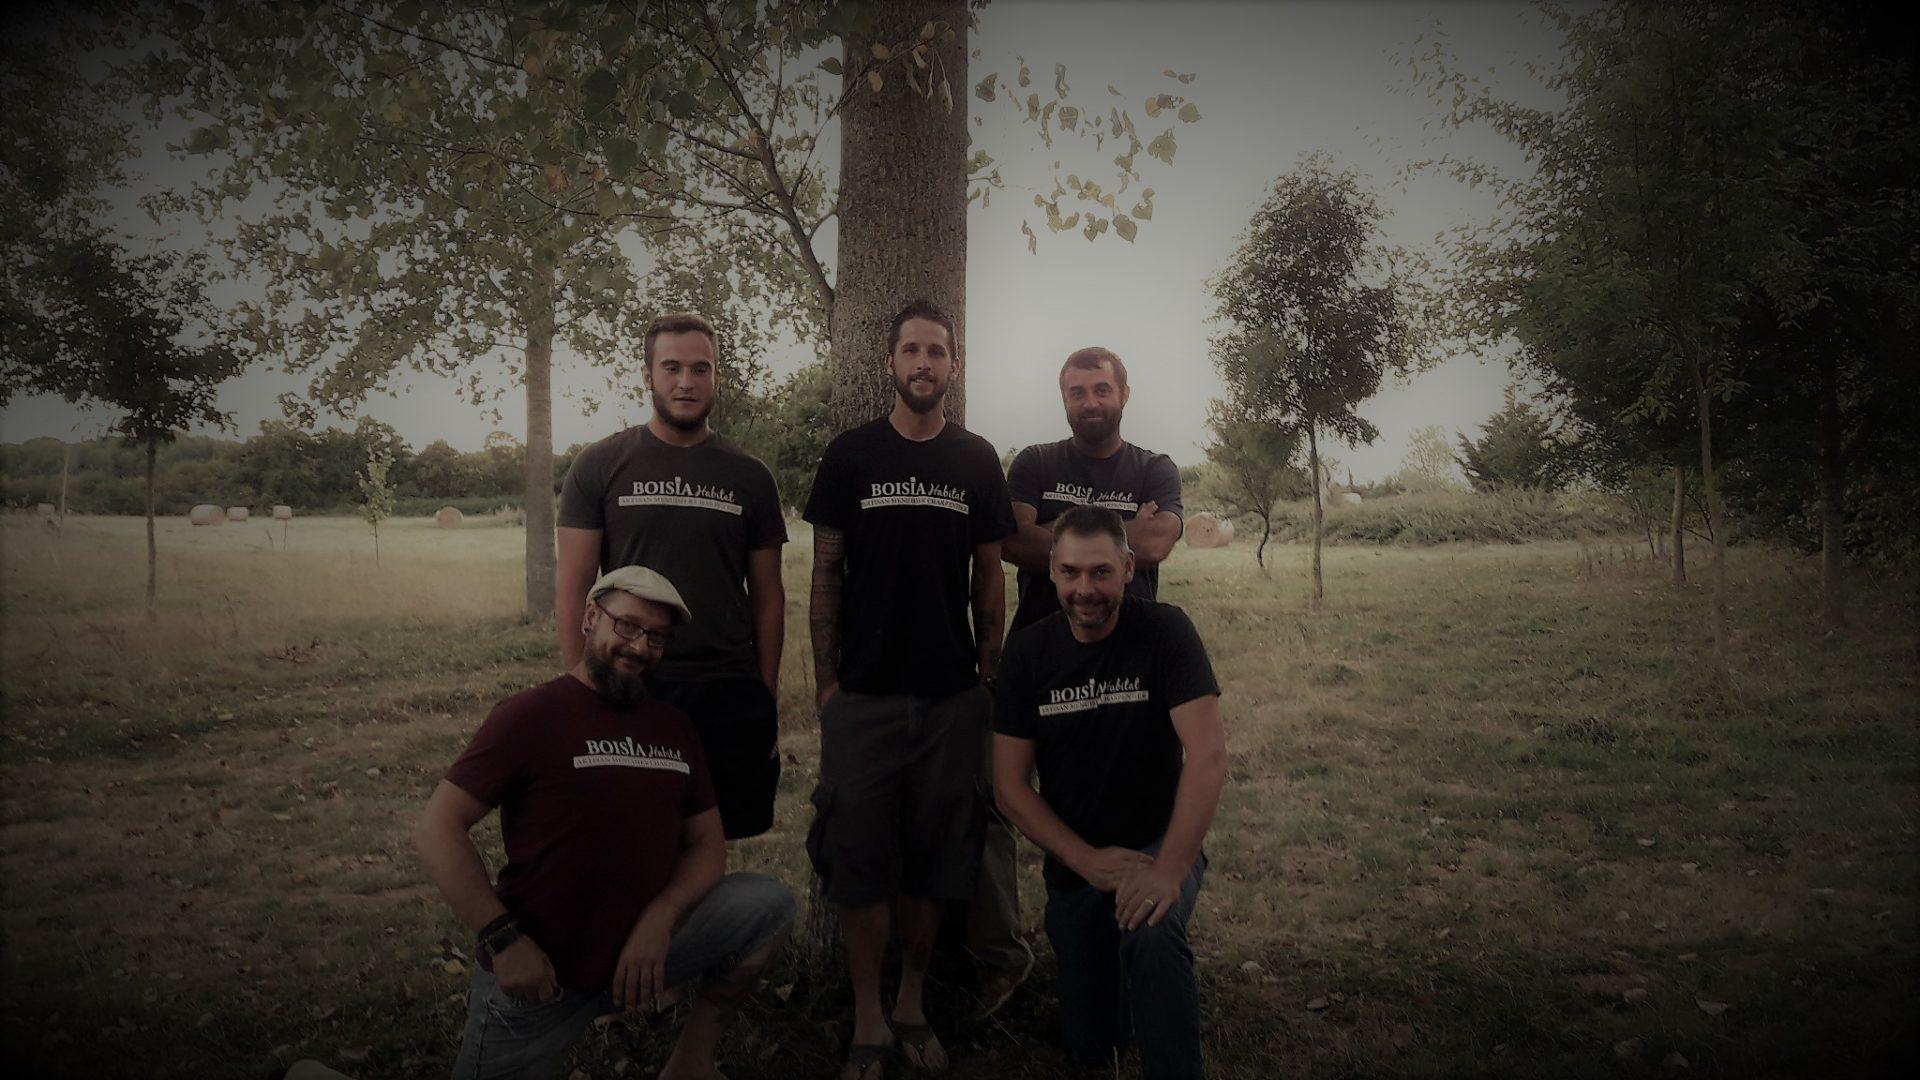 L'équipe de Boisia-Habitat, menuisier, charpentiers